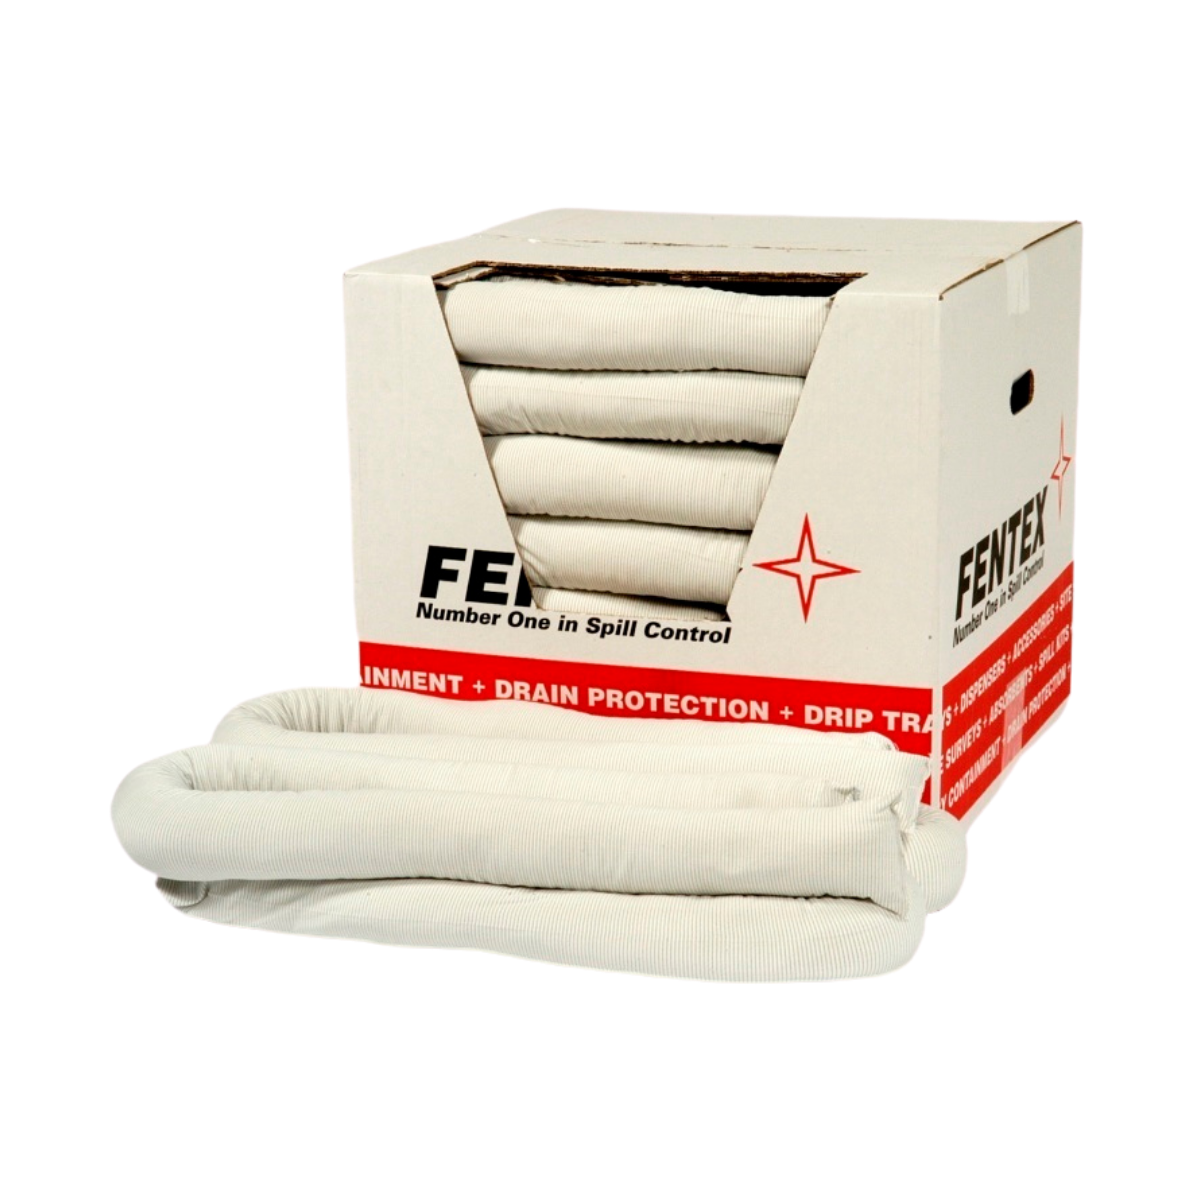 SC0330 Pack of 10 Oil Absorbent 8cm x 1.2m (45L) Spill Socks